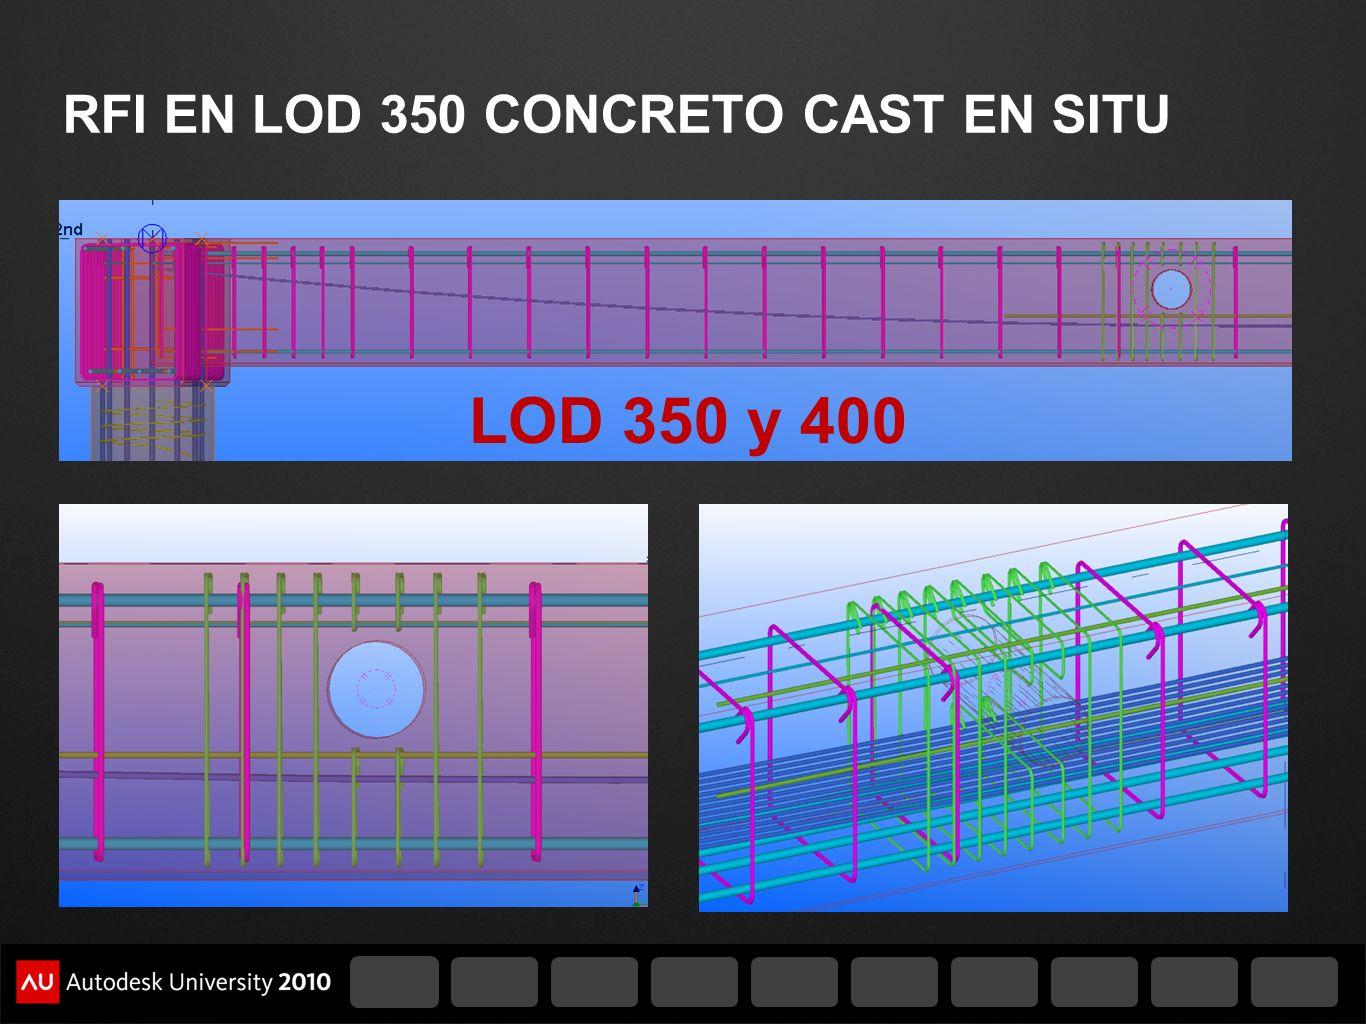 RFI EN LOD 350 CONCRETO CAST EN SITU